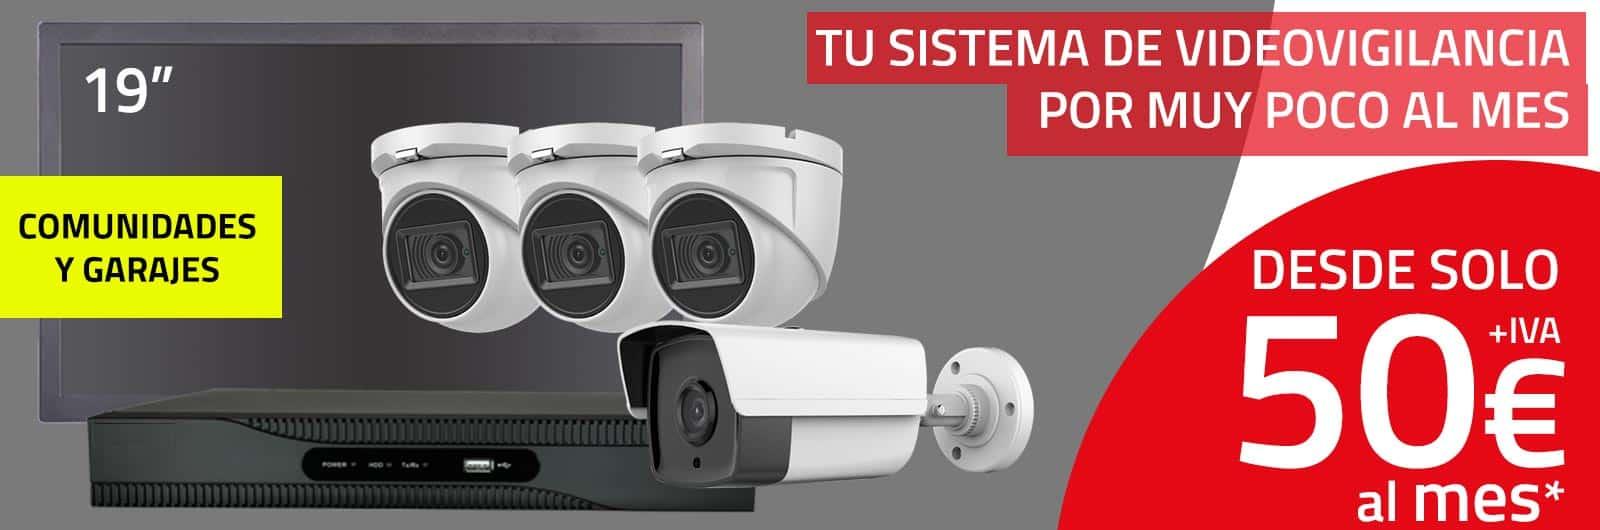 camaras-vigilancia-comunidades-emrpesa-instalacion-madrid